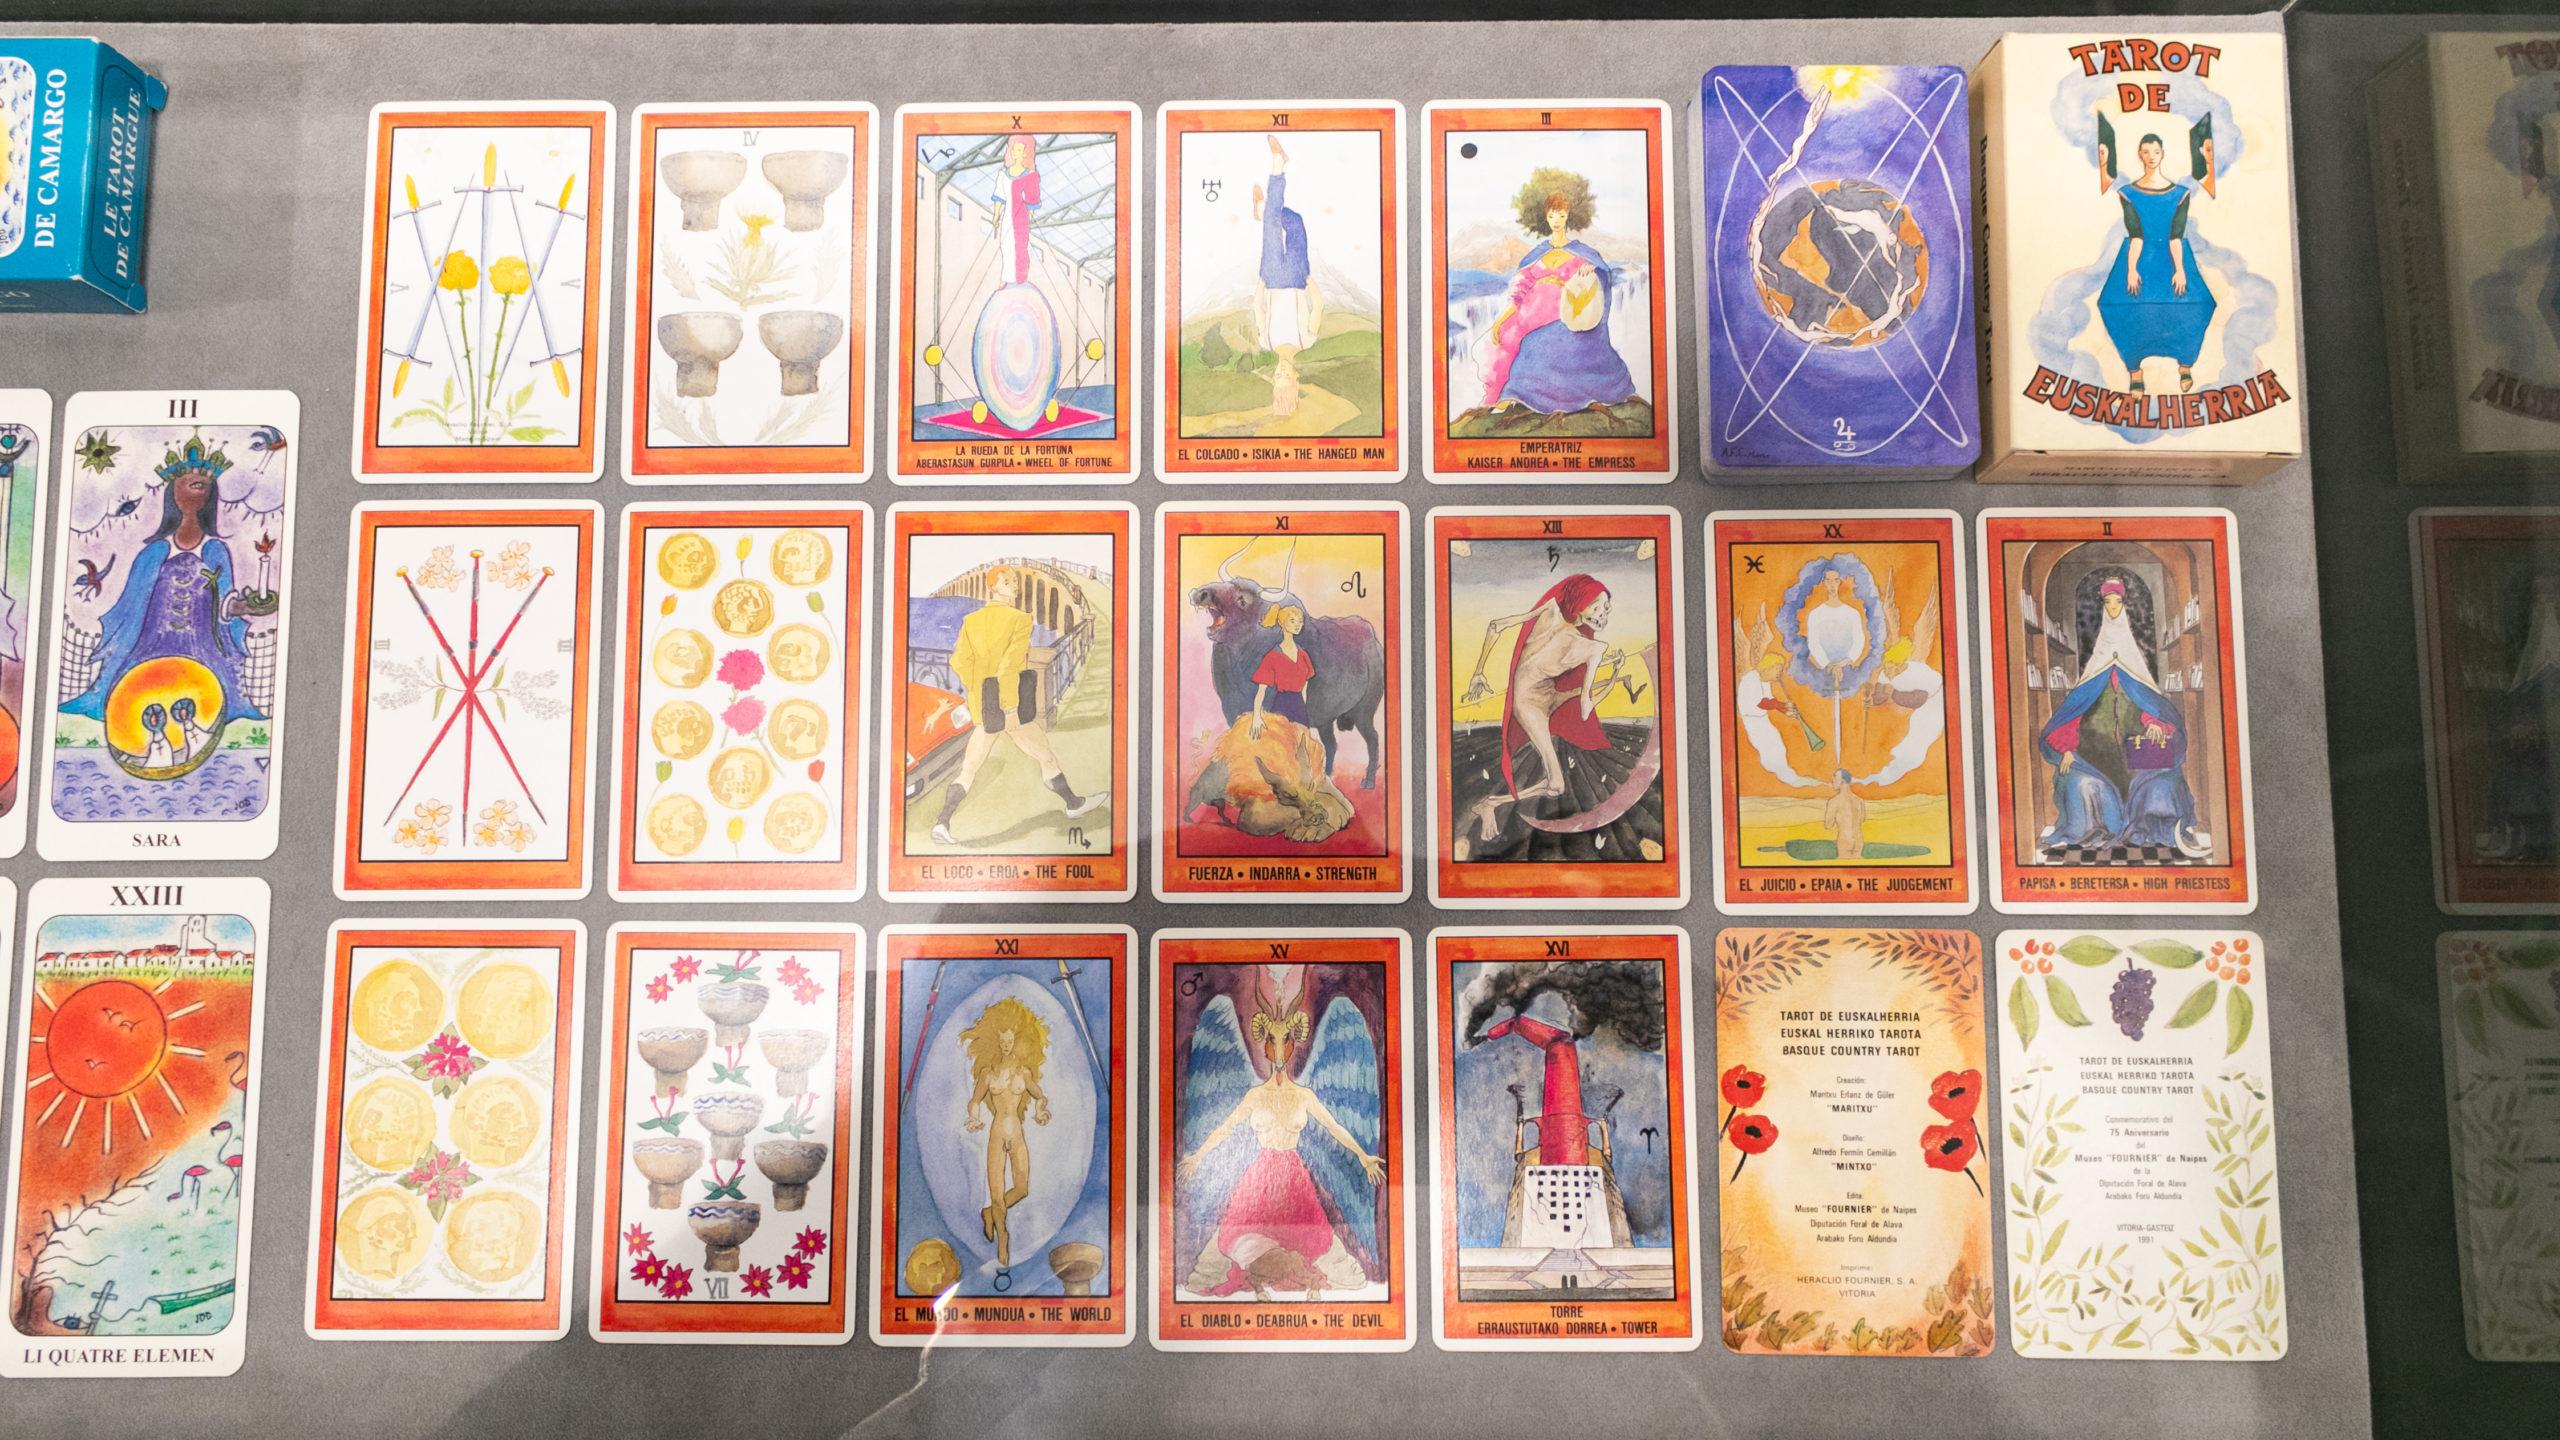 Tarot-Opening-Reception_031320_24-1